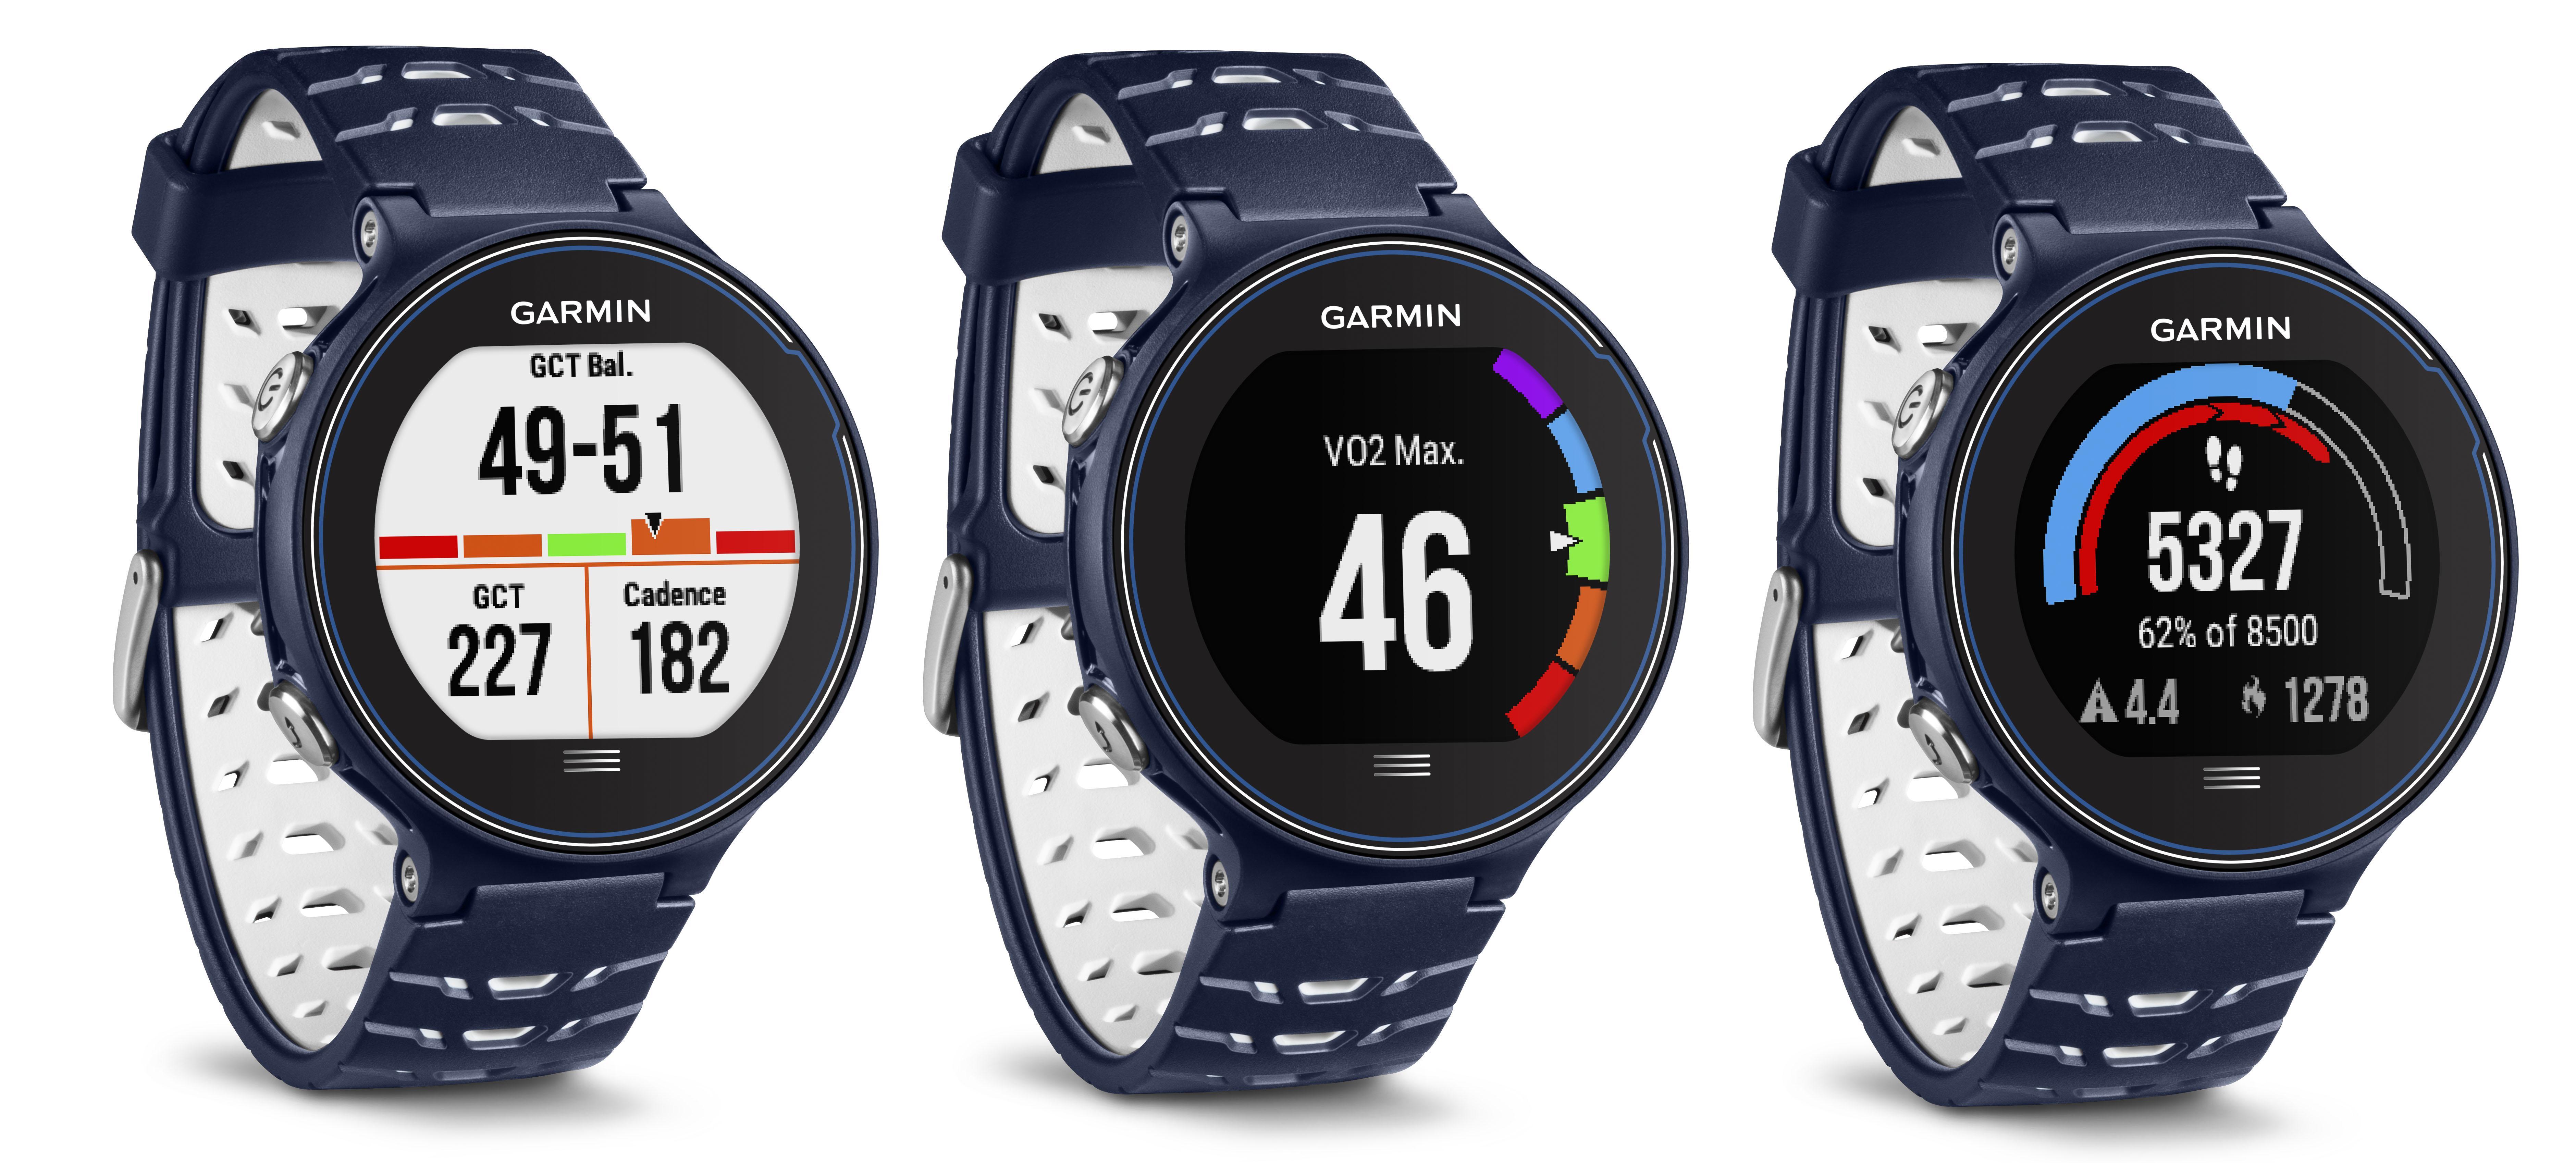 Montre connectées GPS Garmin Forerunner 630 ou Fenix 2 Performer